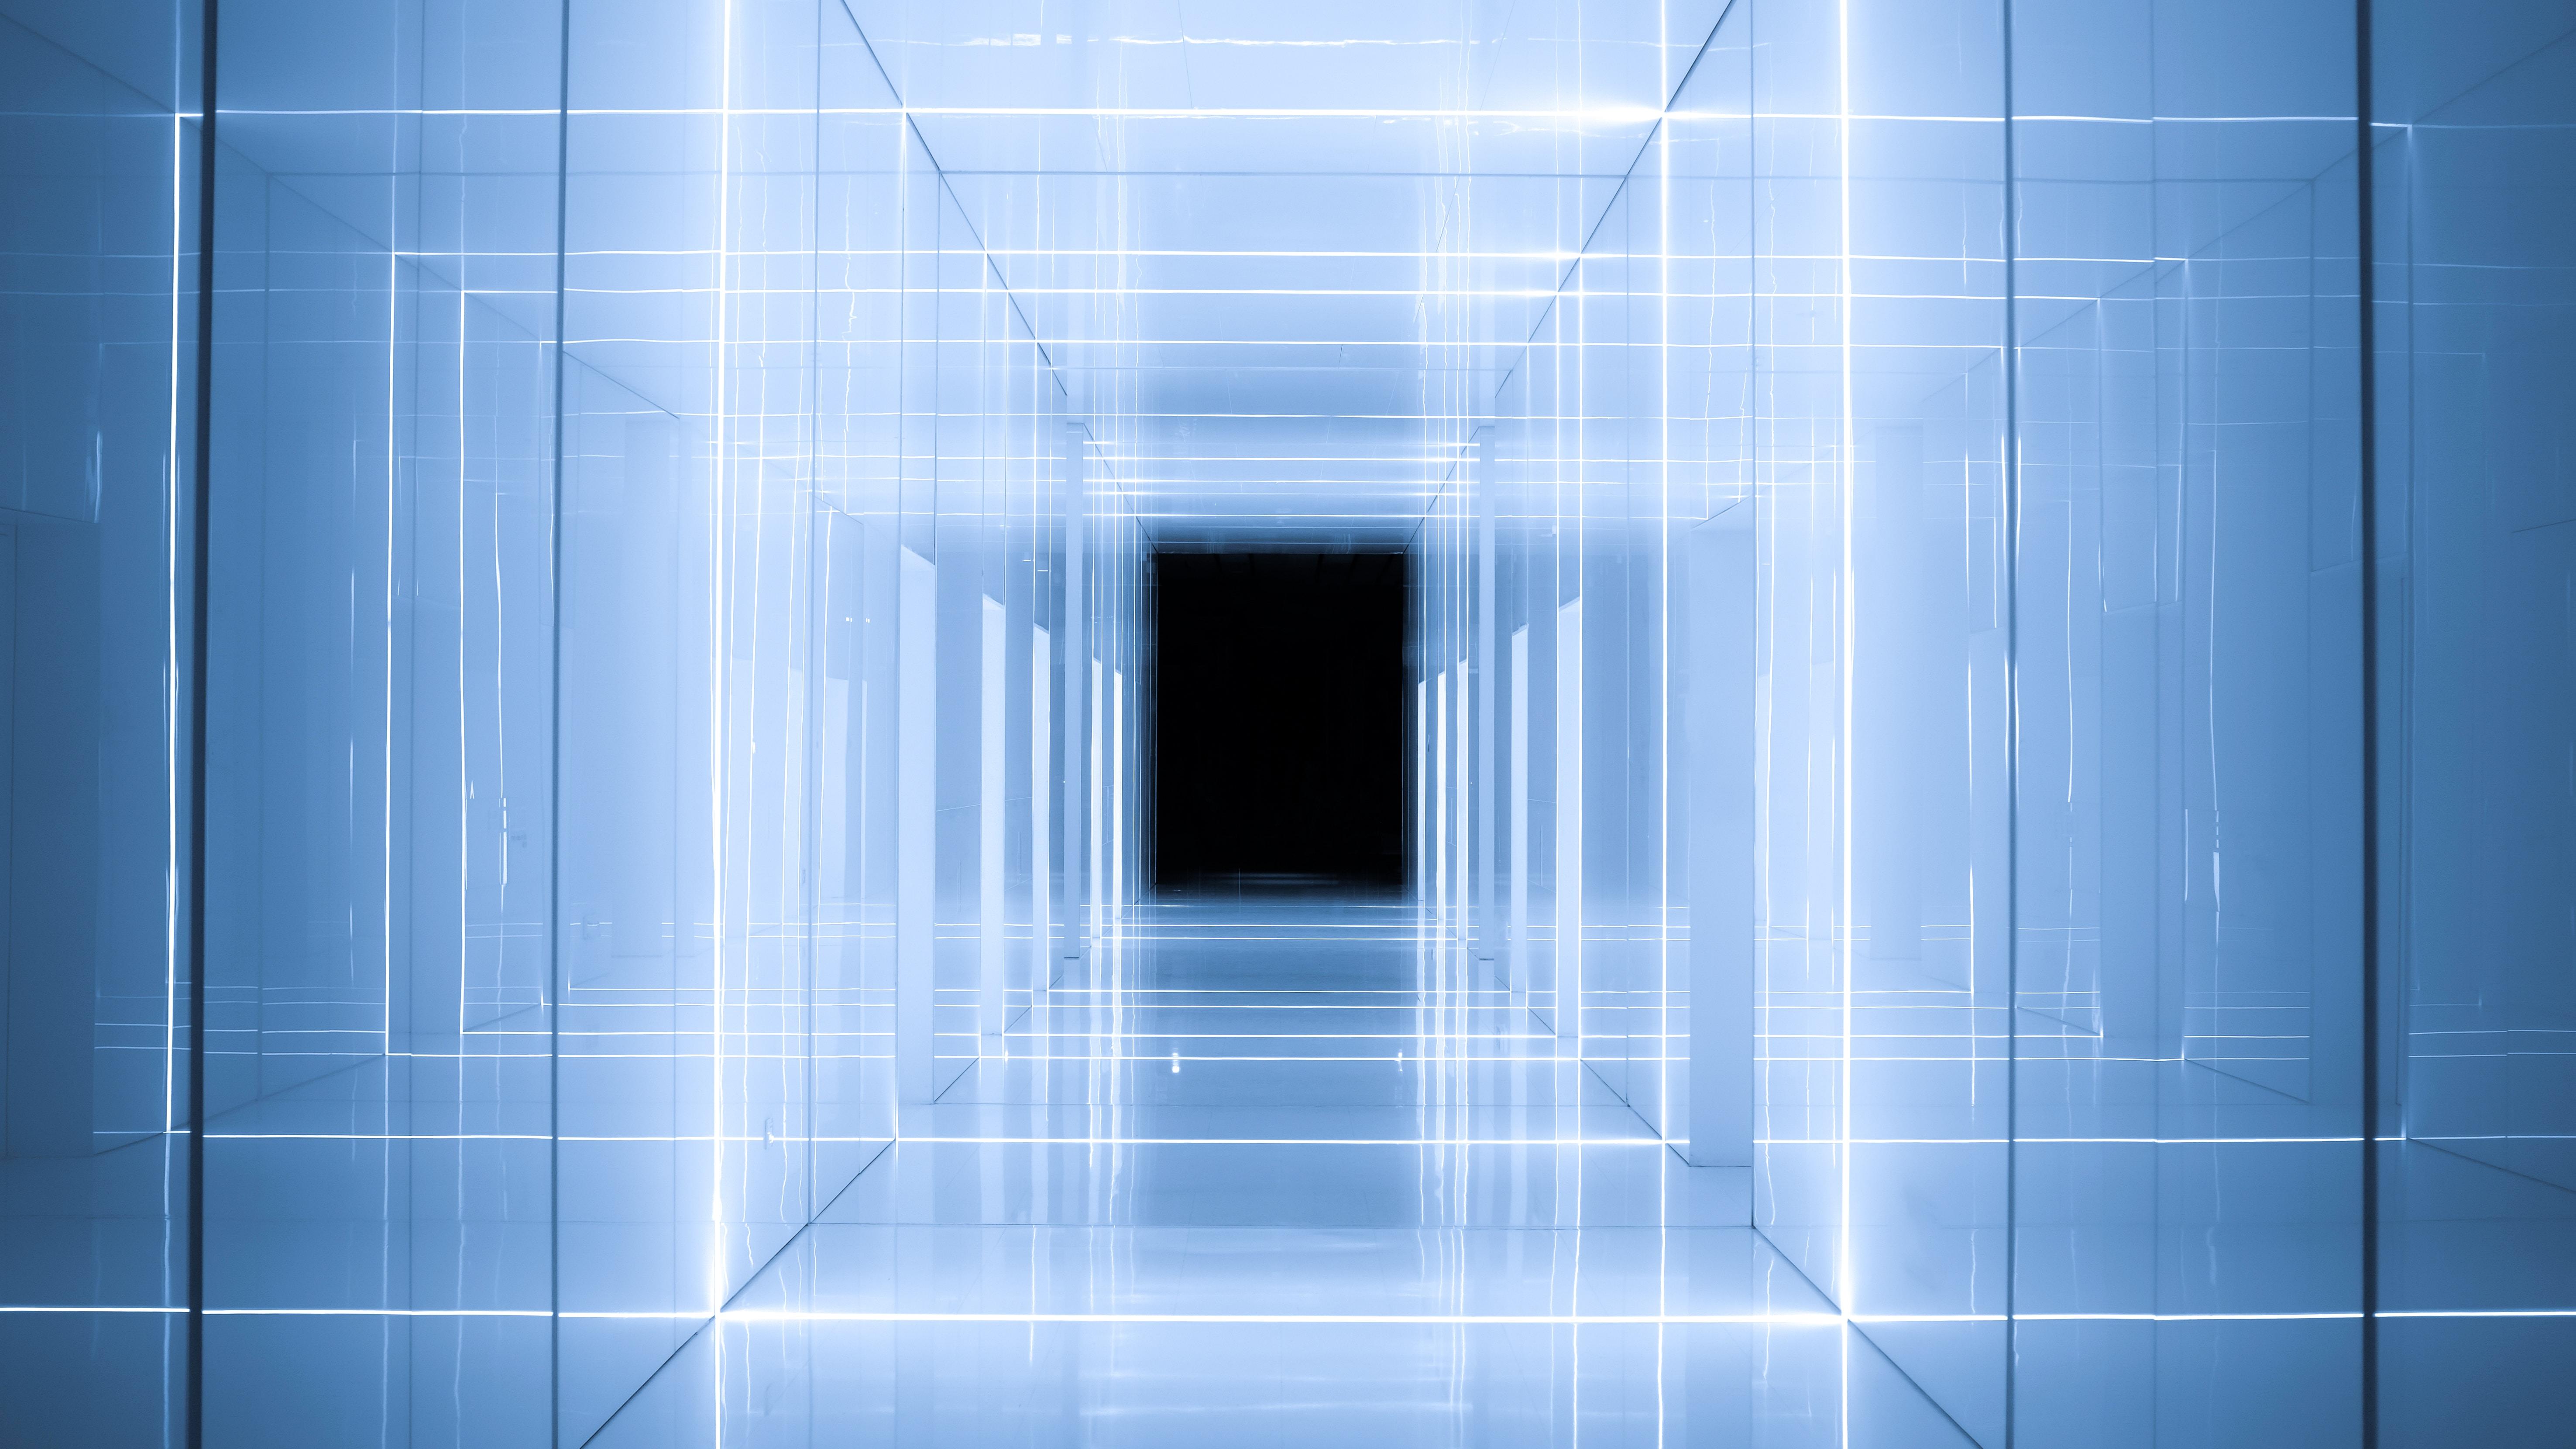 mirrored pathway